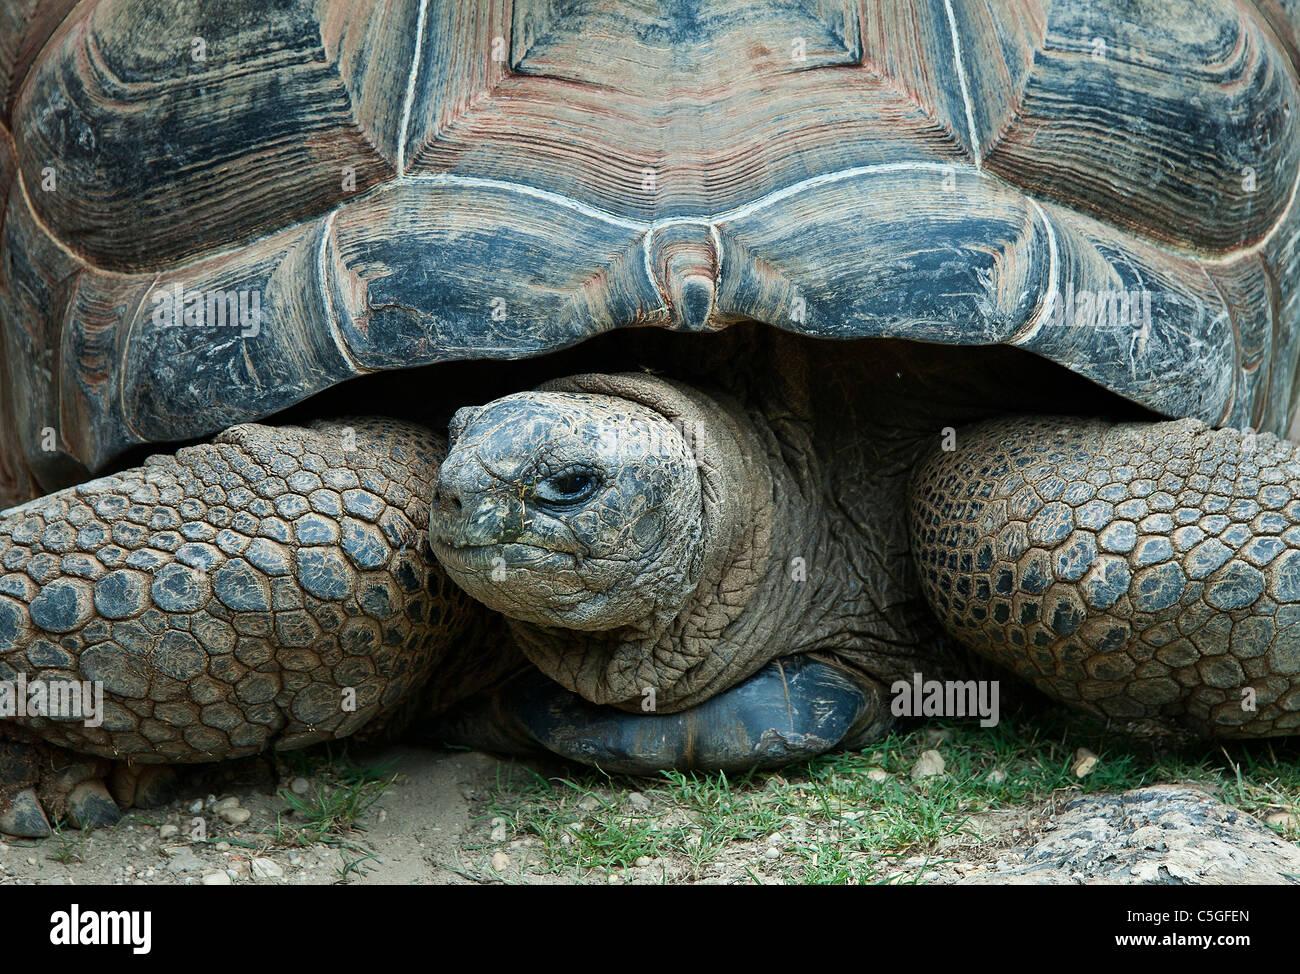 Giant tortoise. - Stock Image